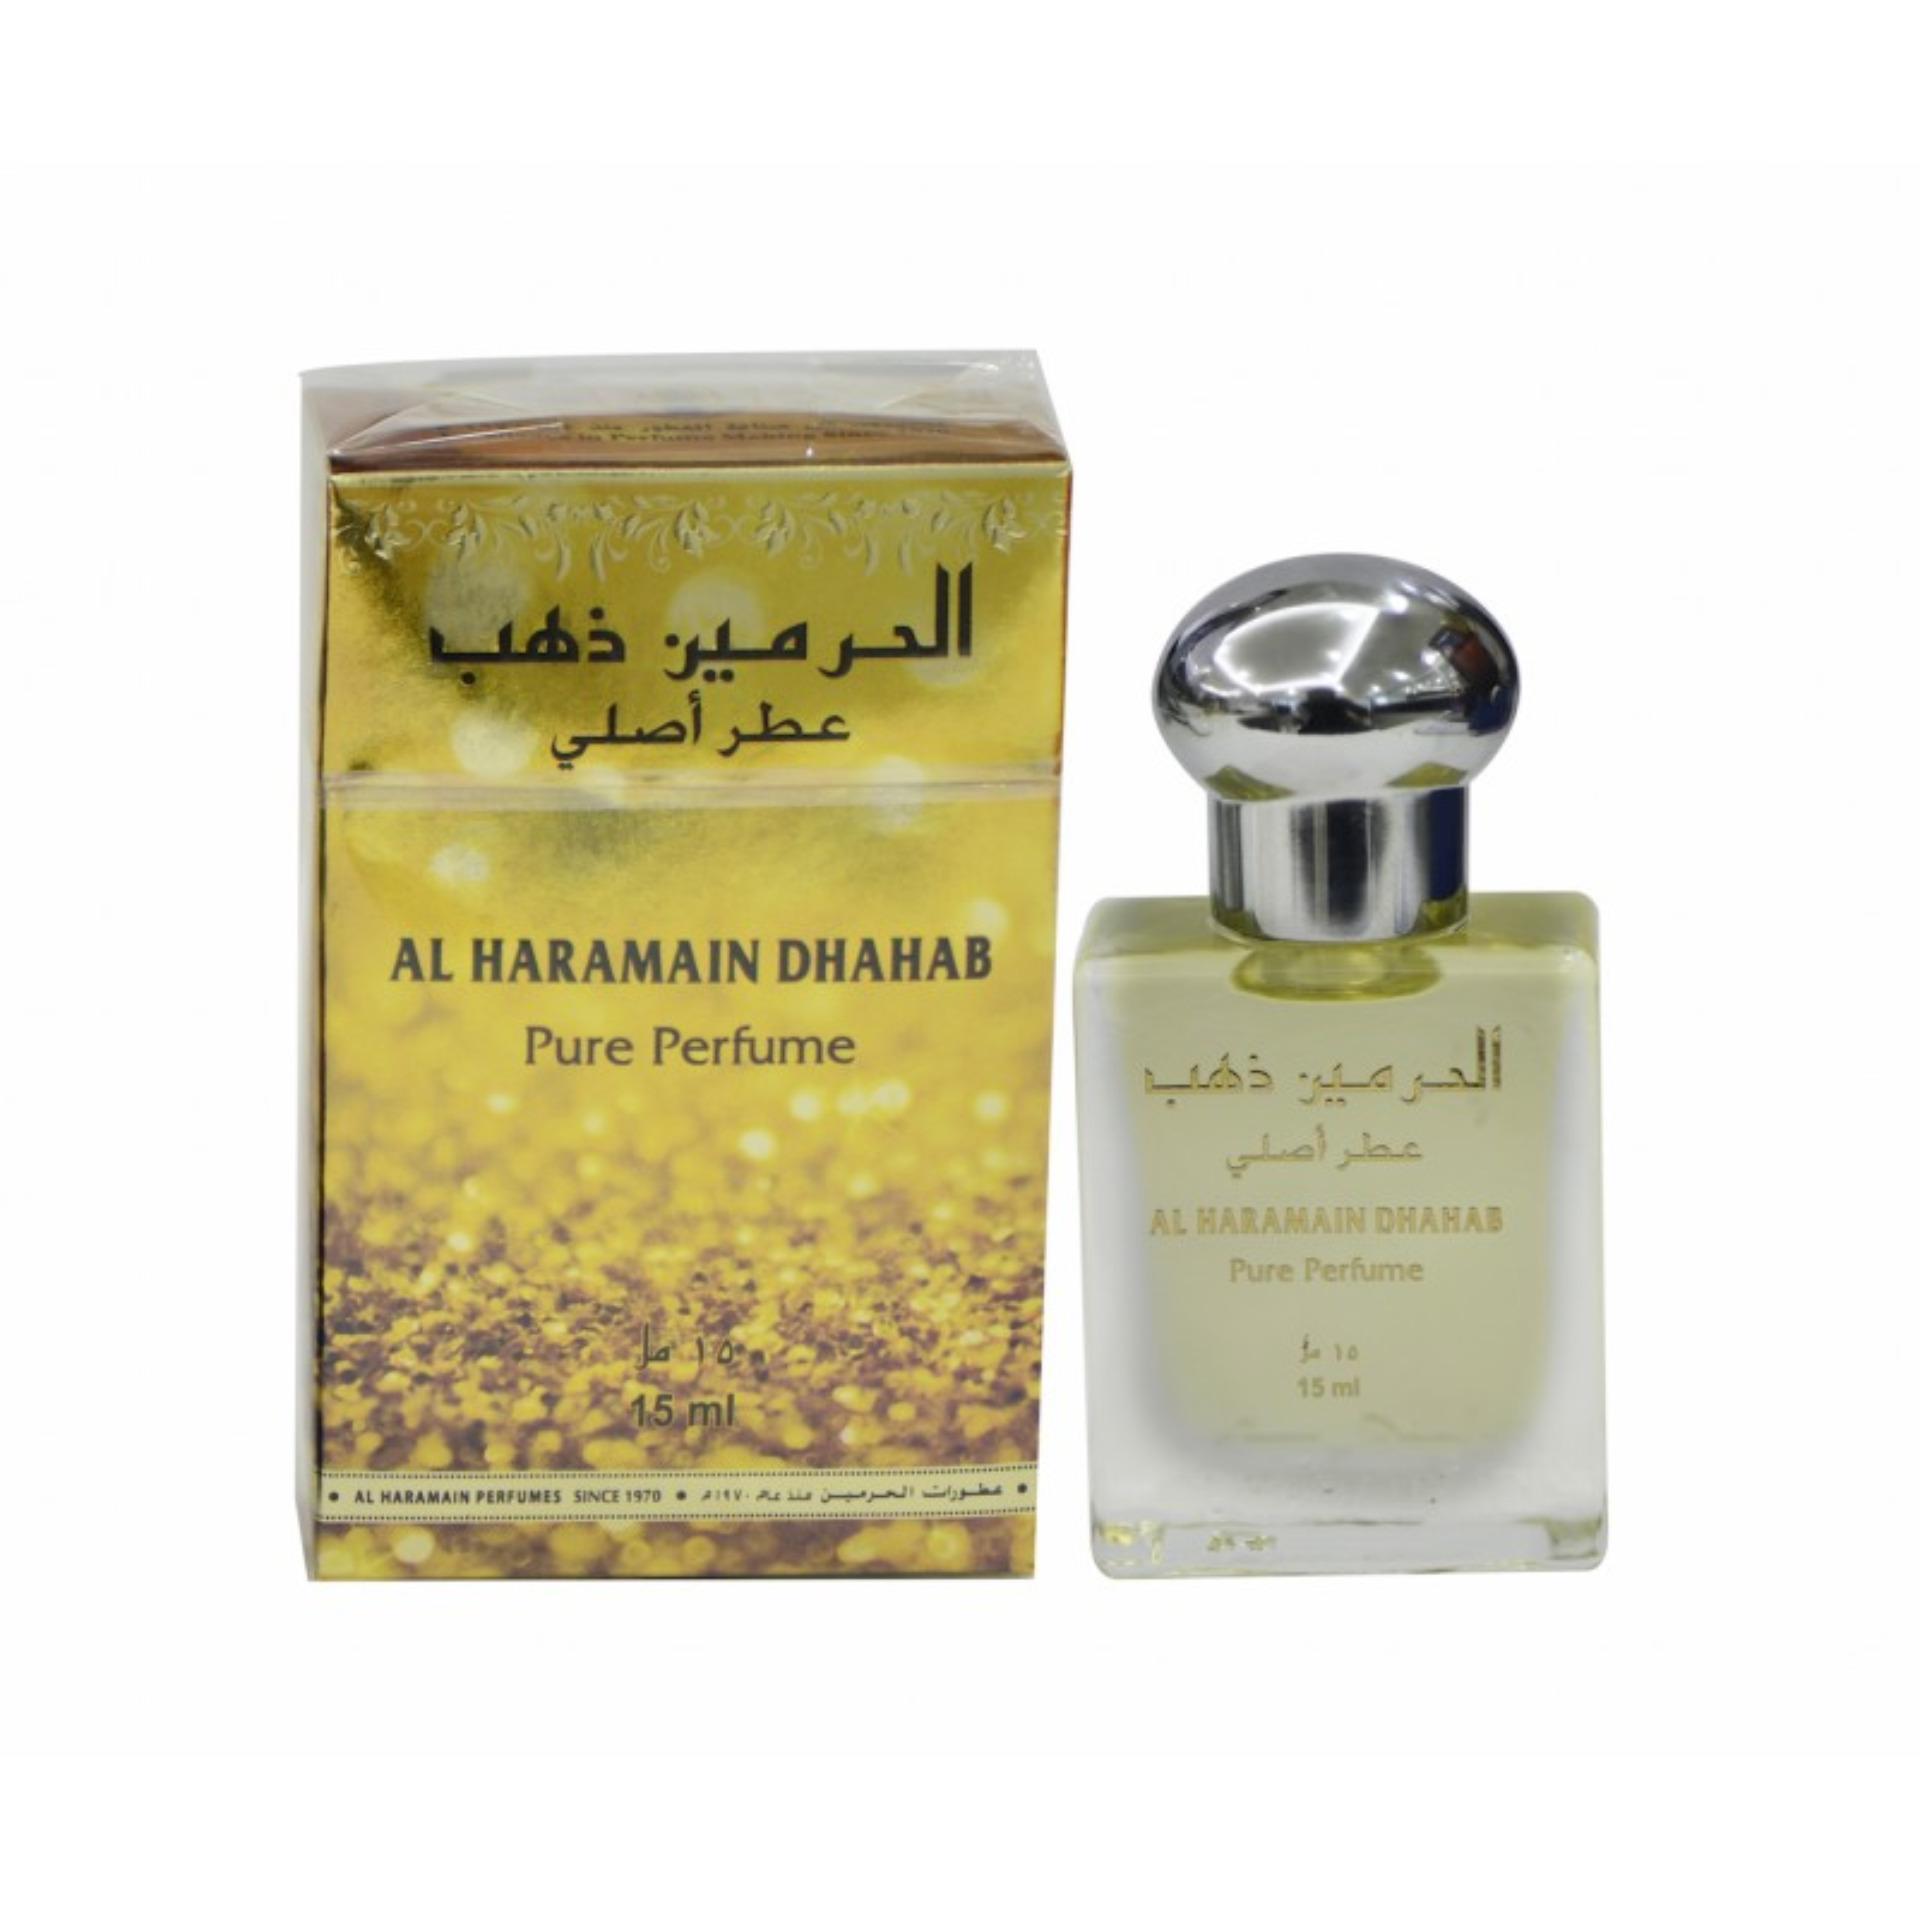 Parfum AL HARAMAIN DHAHAB Perfume 100% Original Impor Arab Non Alkohol 15ml Parfume Minyak Wangi Parfum ALHARAMAIN HARAMAIN AL HAROMAIN ALHAROMAIN HAROMAIN